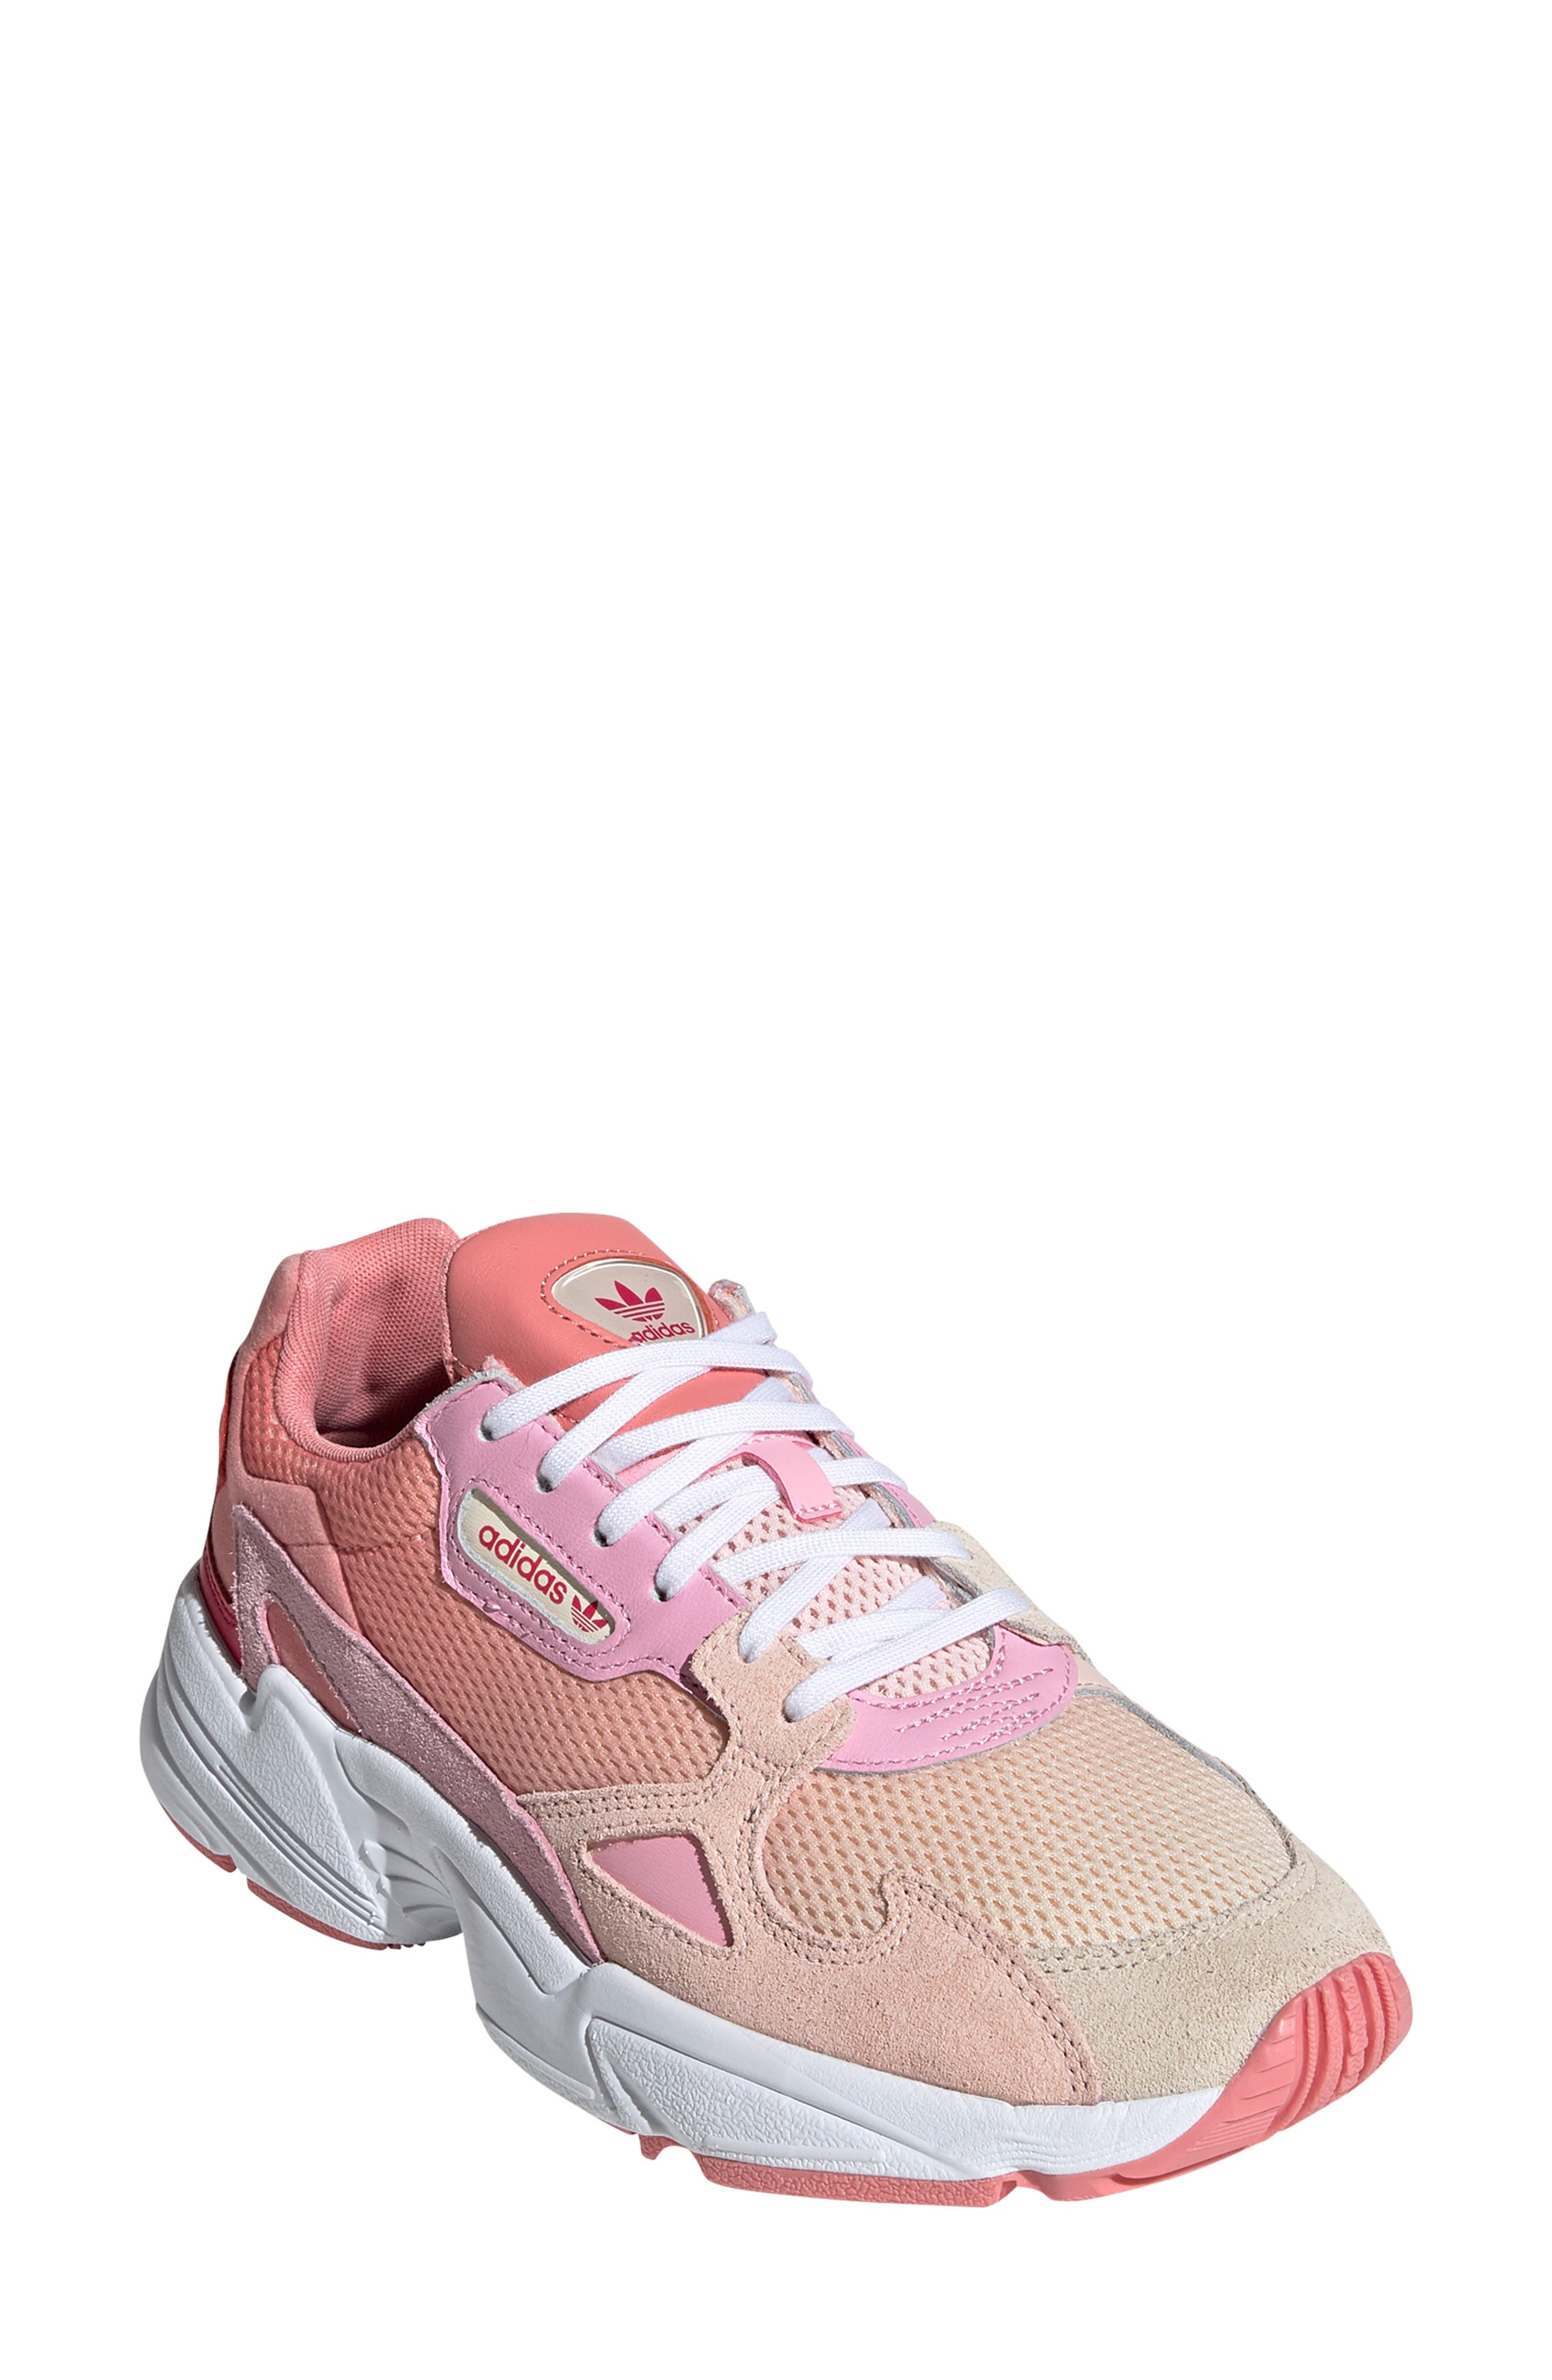 Adidas Falcon Sneaker- Pink